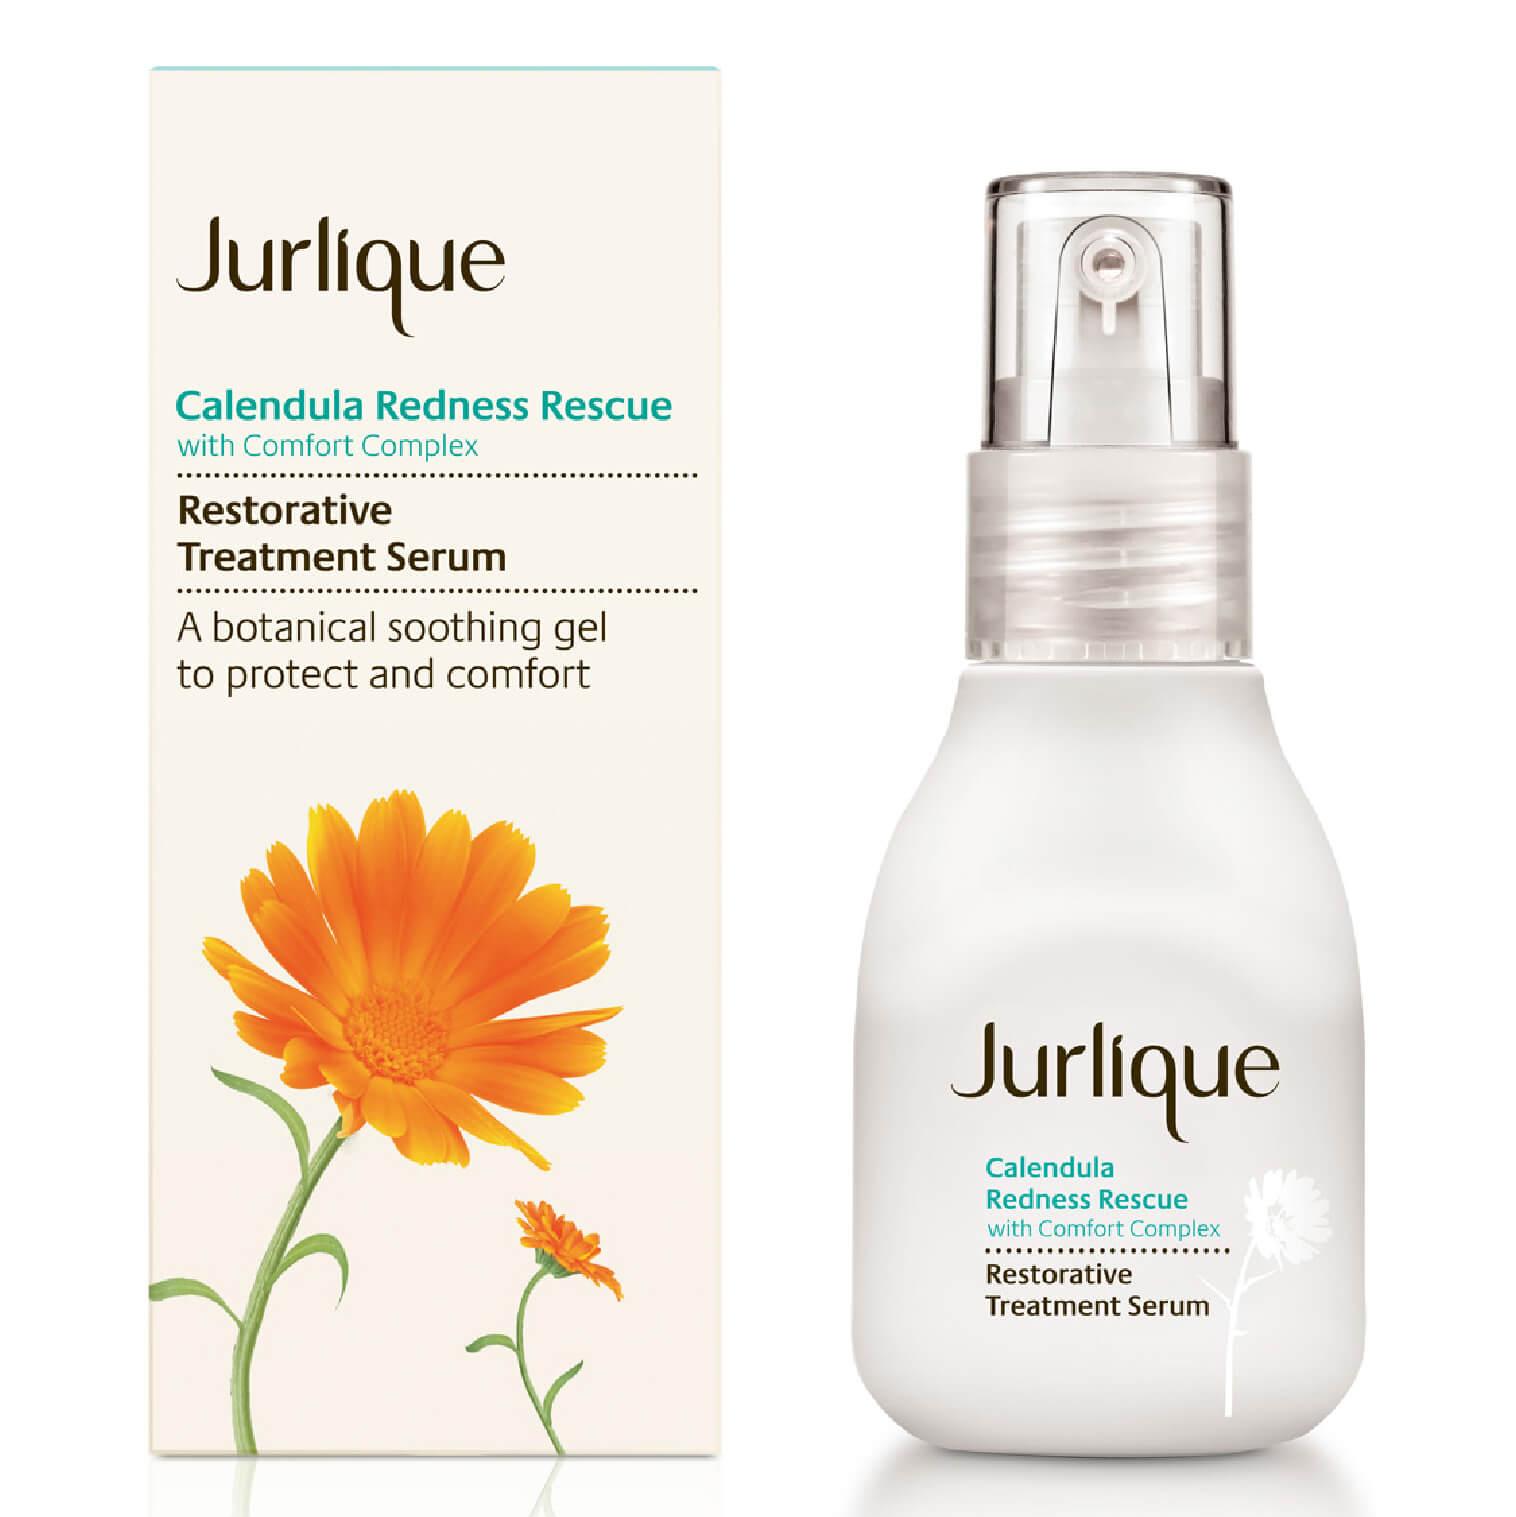 Jurlique Calendula Redness Rescue Restorative Serum (30ml)